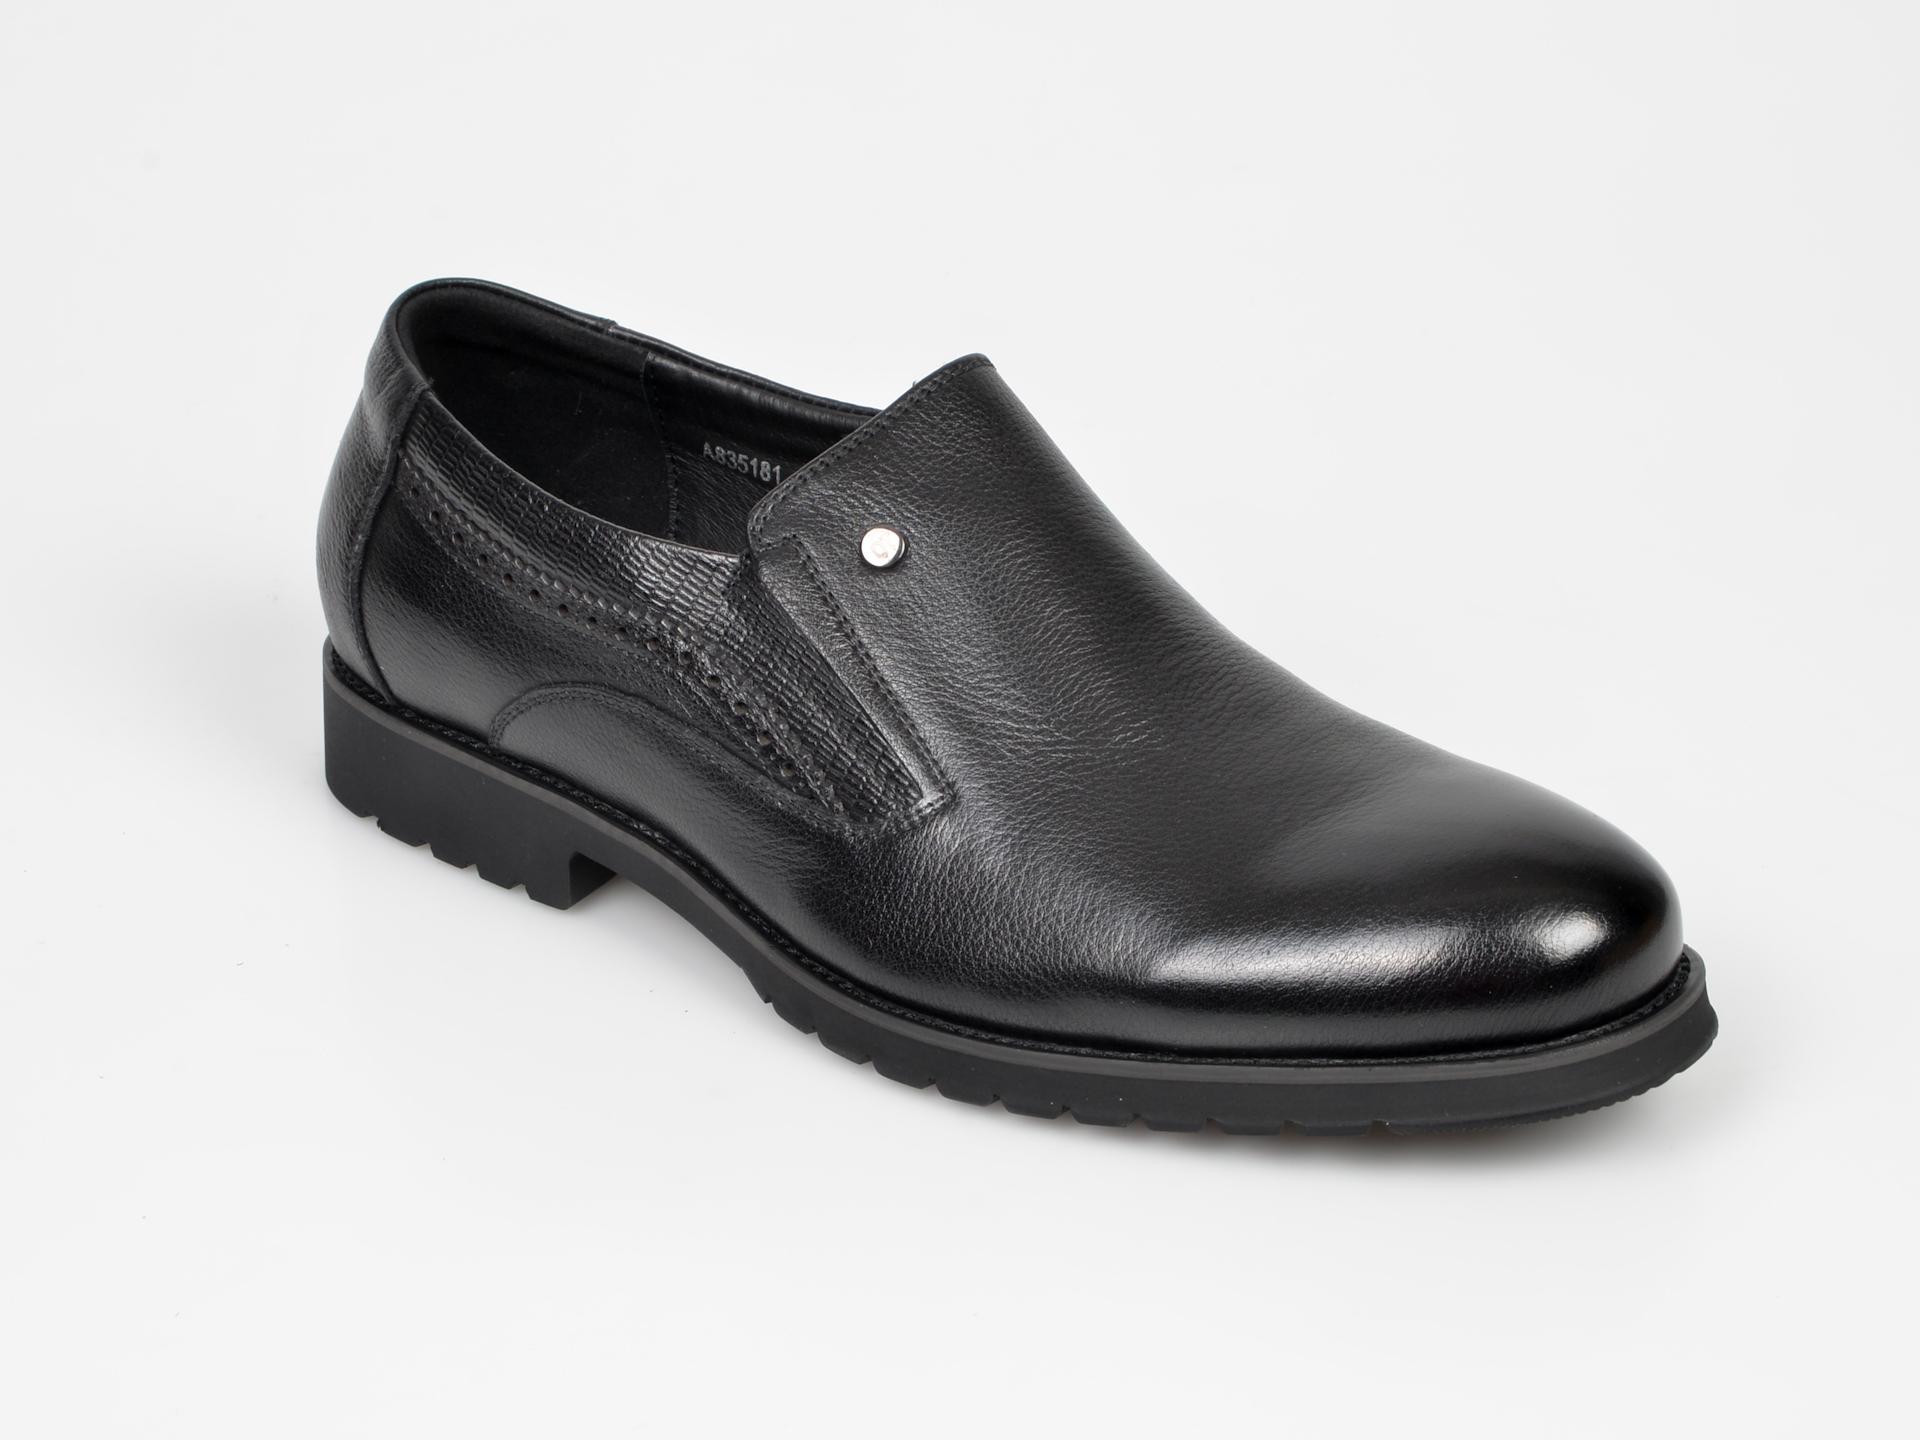 Pantofi Otter Negri, A835181, Din Piele Naturala